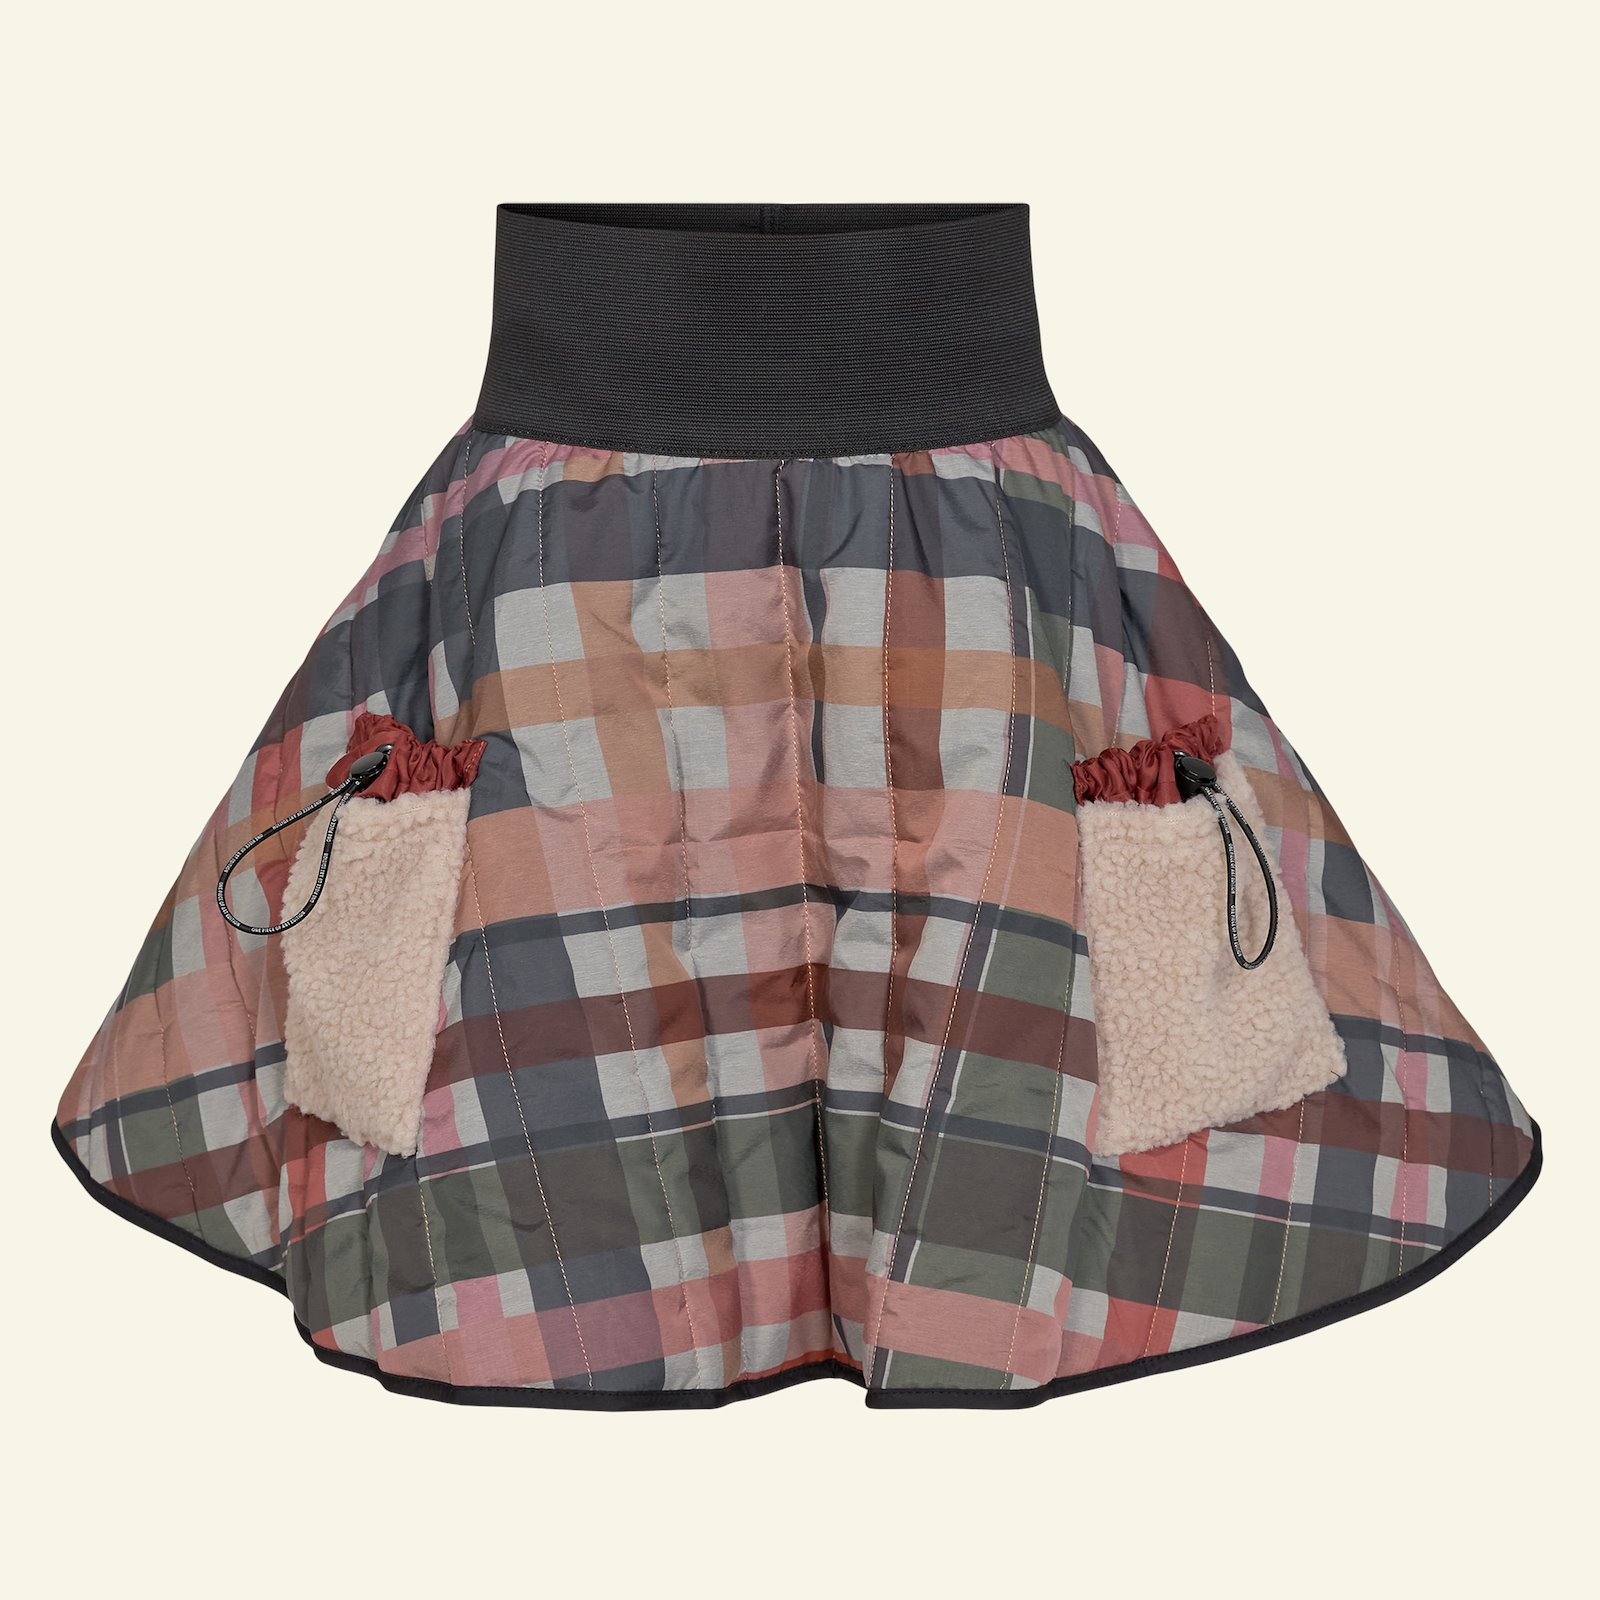 Skirt circular, 140/10y p61019_920227_3509016_64080_910273_8038_3509073_45705_sskit